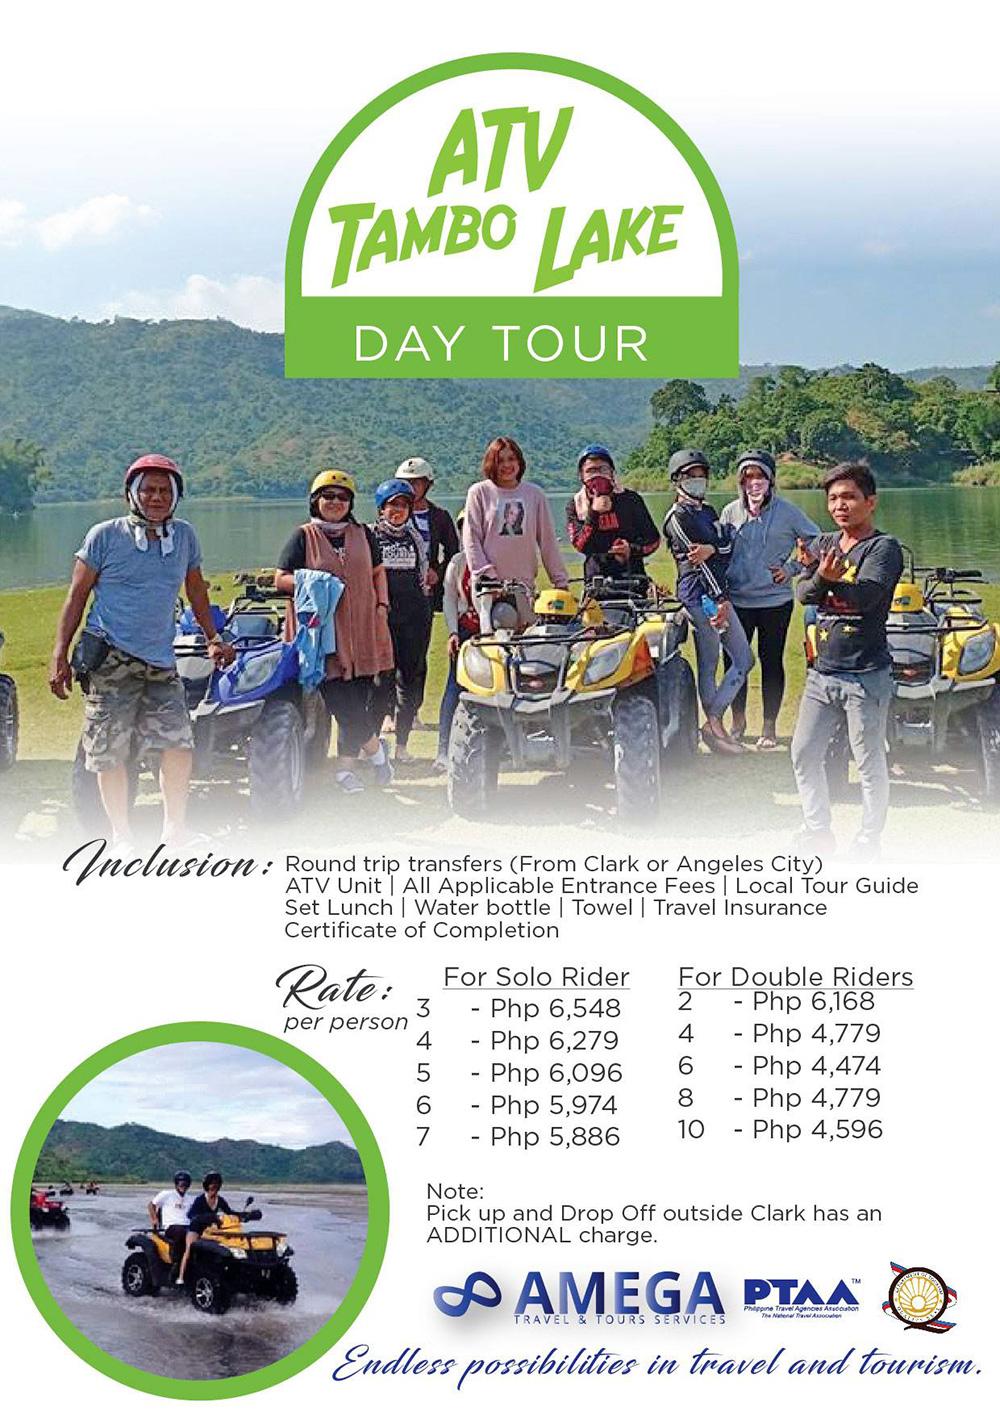 ATV-TAMBO-LAKE